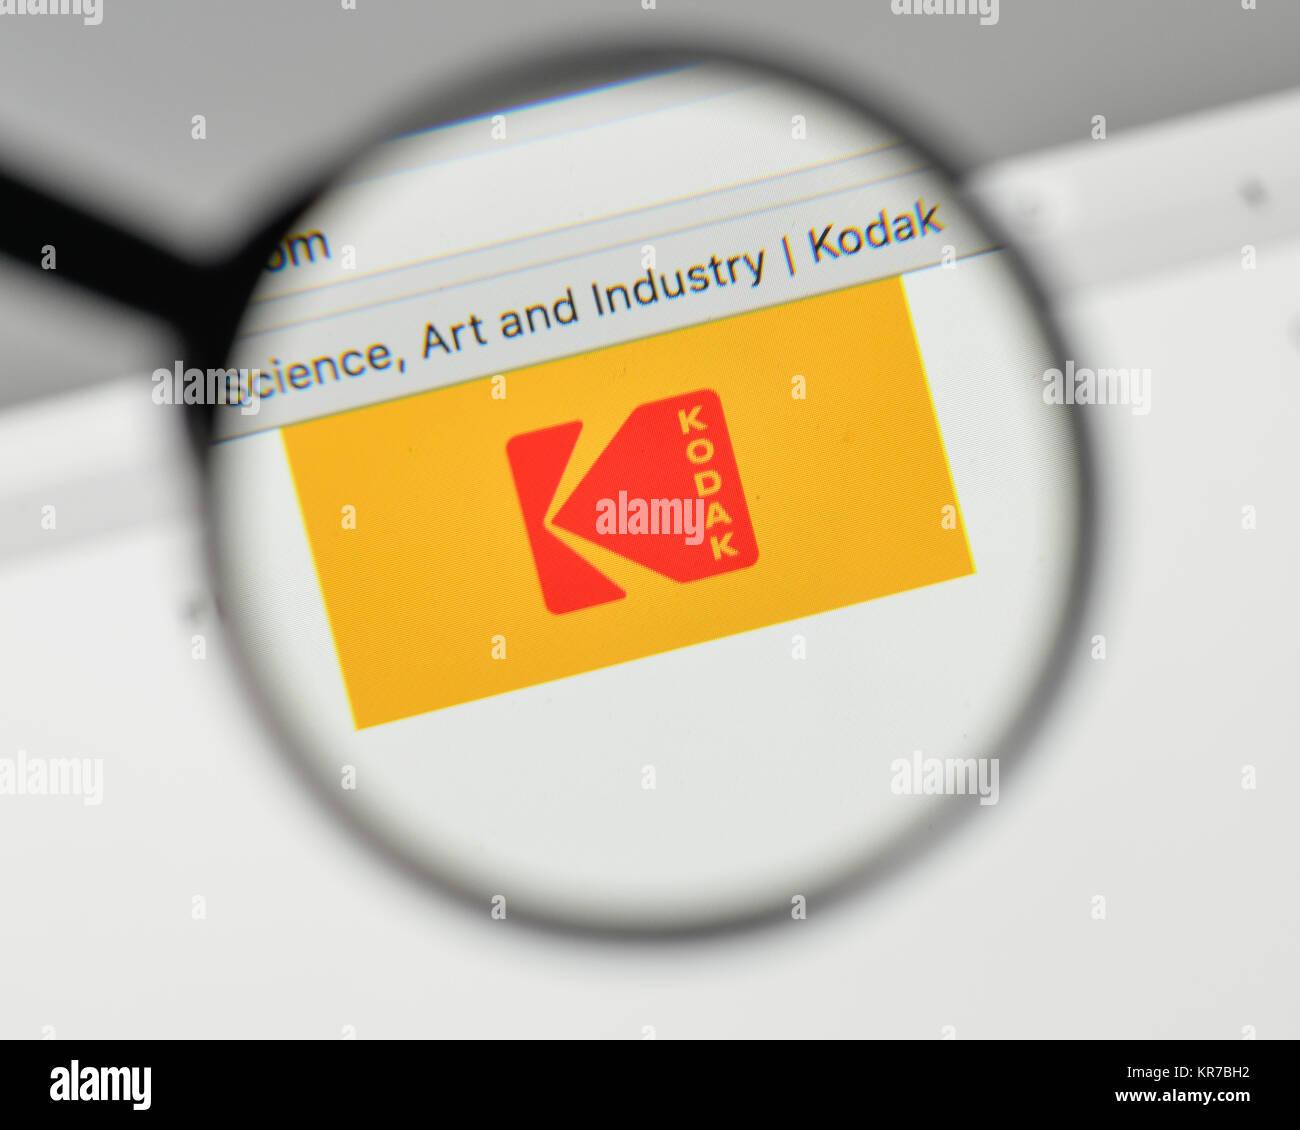 Milan, Italy - November 1, 2017: Kodak logo on the website